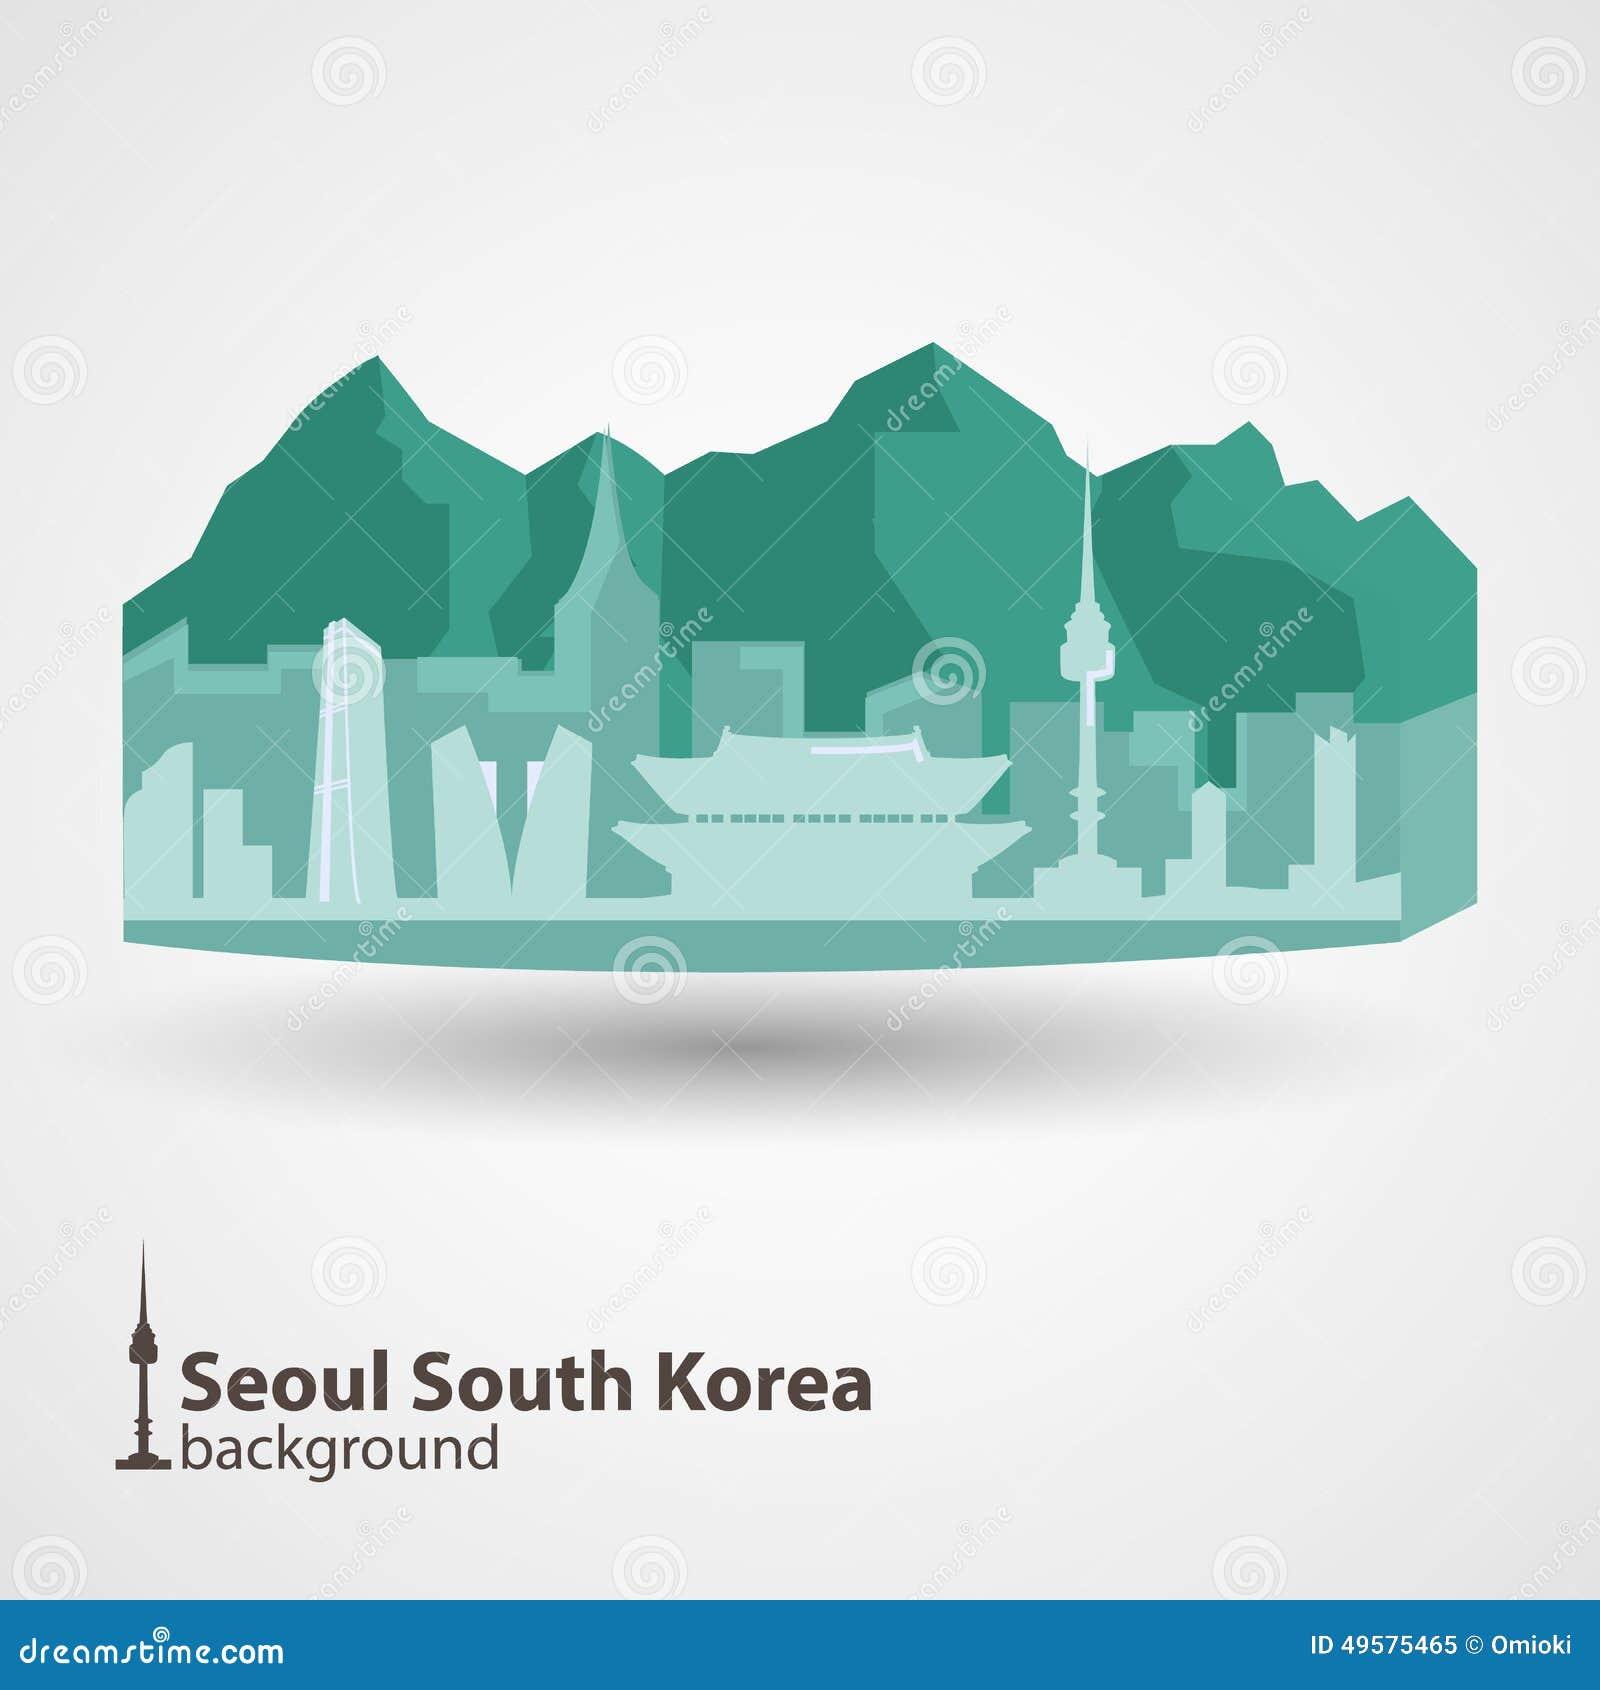 Seoul, South Korea Skyline Illustration Stock Vector - Image: 49575465